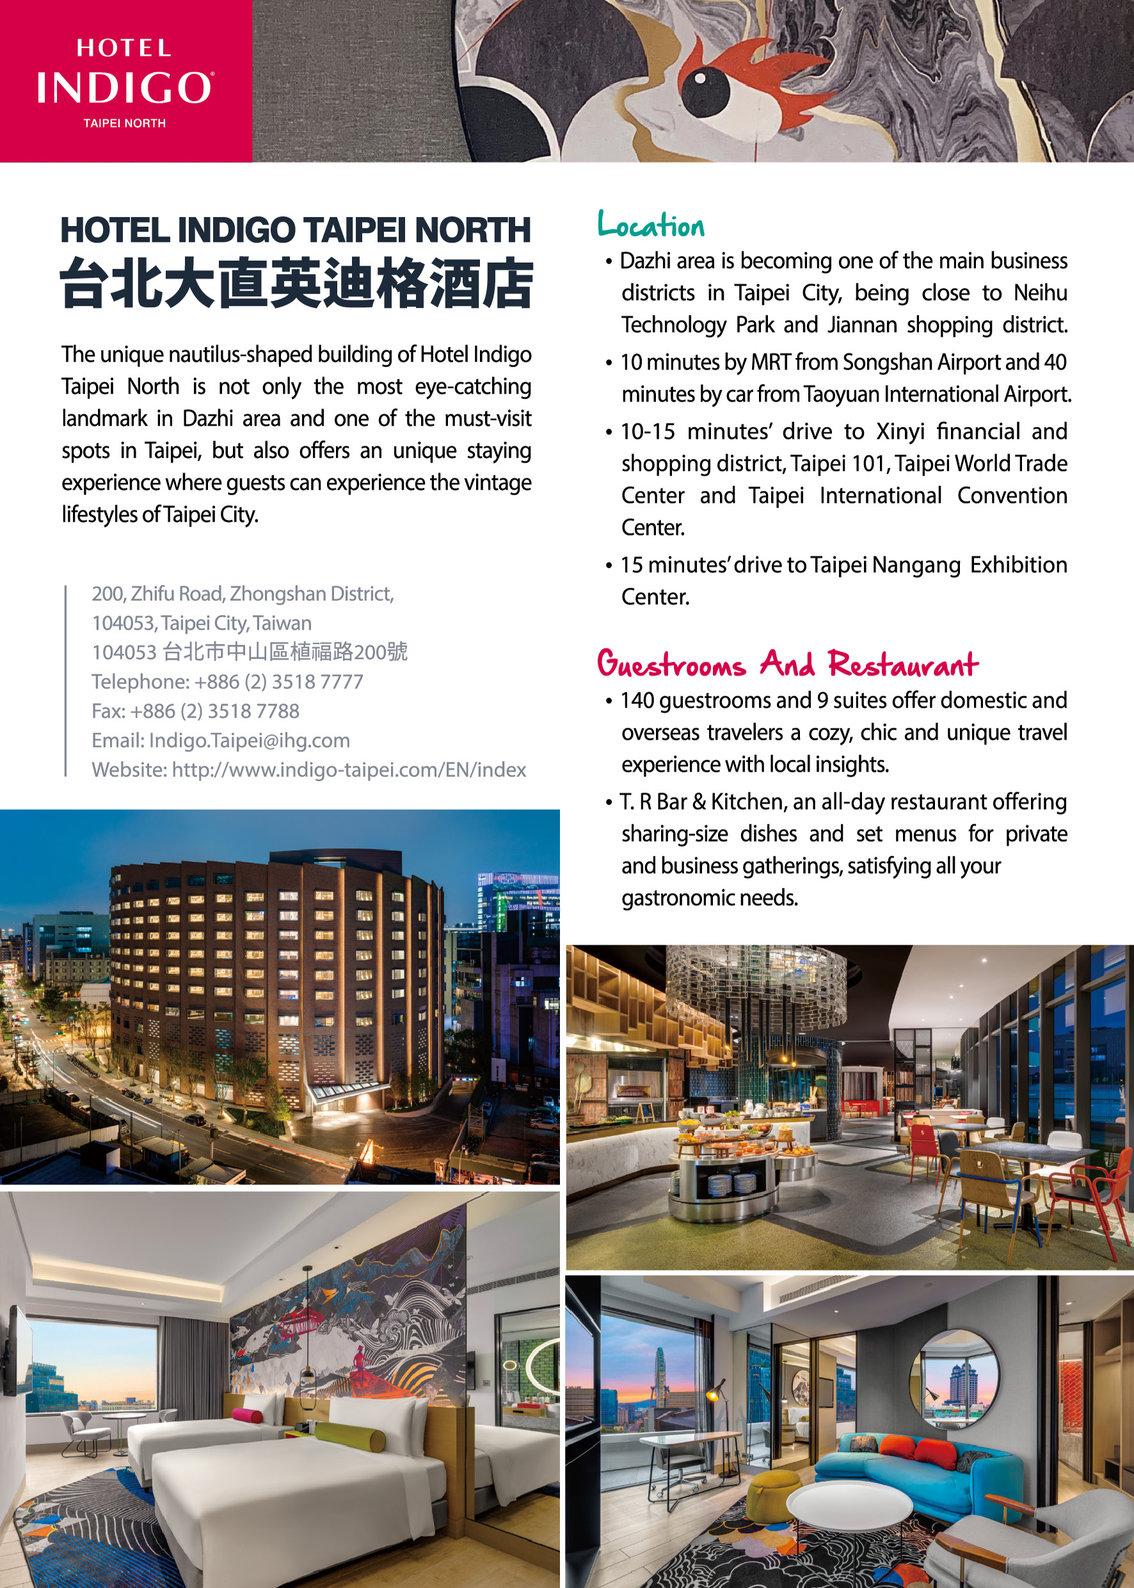 Hotel Indigo Taipei North